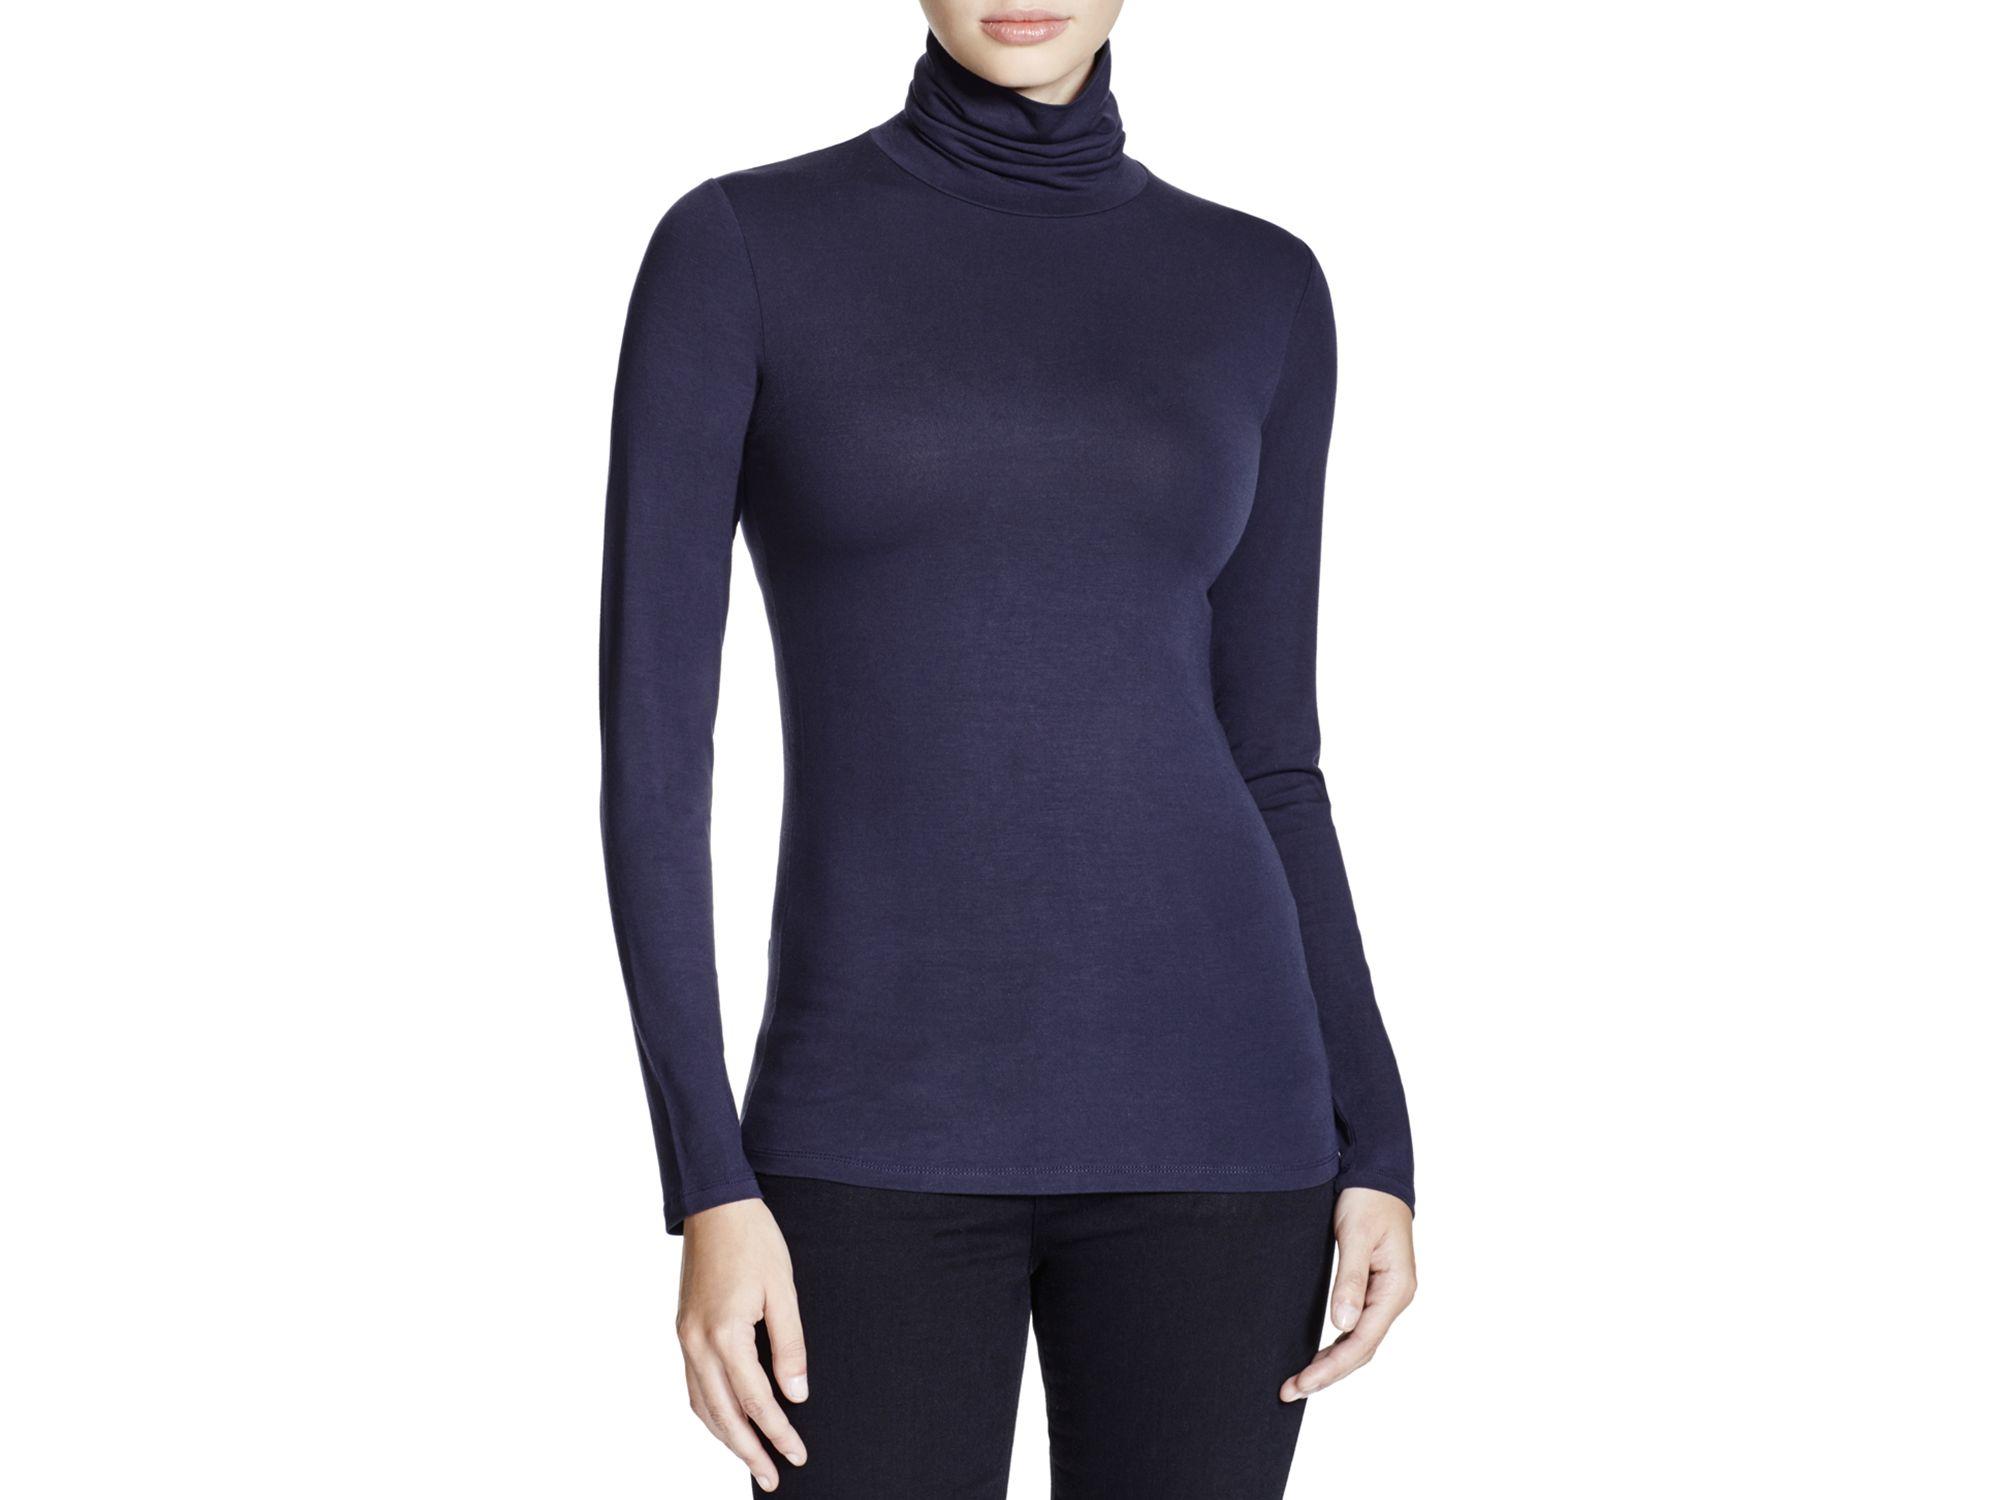 Lyst majestic long sleeve turtleneck shirt in blue for Long sleeve black turtleneck shirt